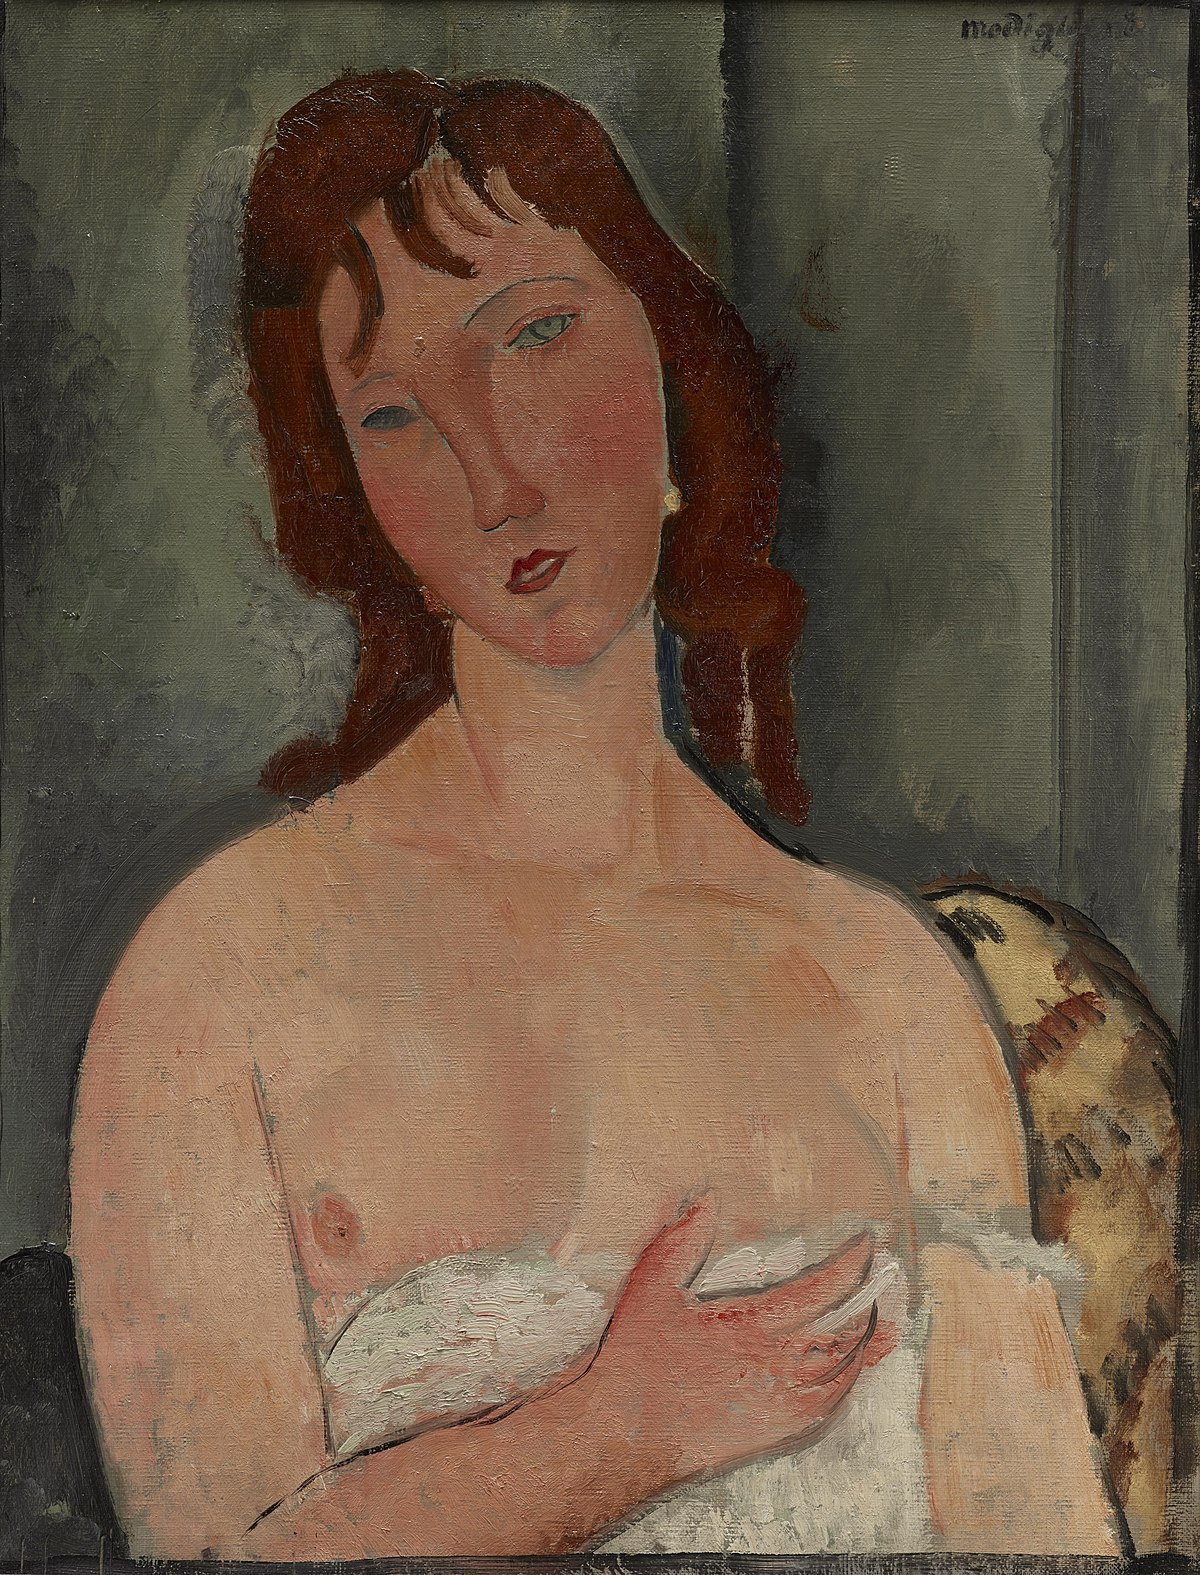 File:Amedeo Modigliani - Portrait of a Young Woman (Dallas Museum of  Art).jpg - Wikimedia Commons